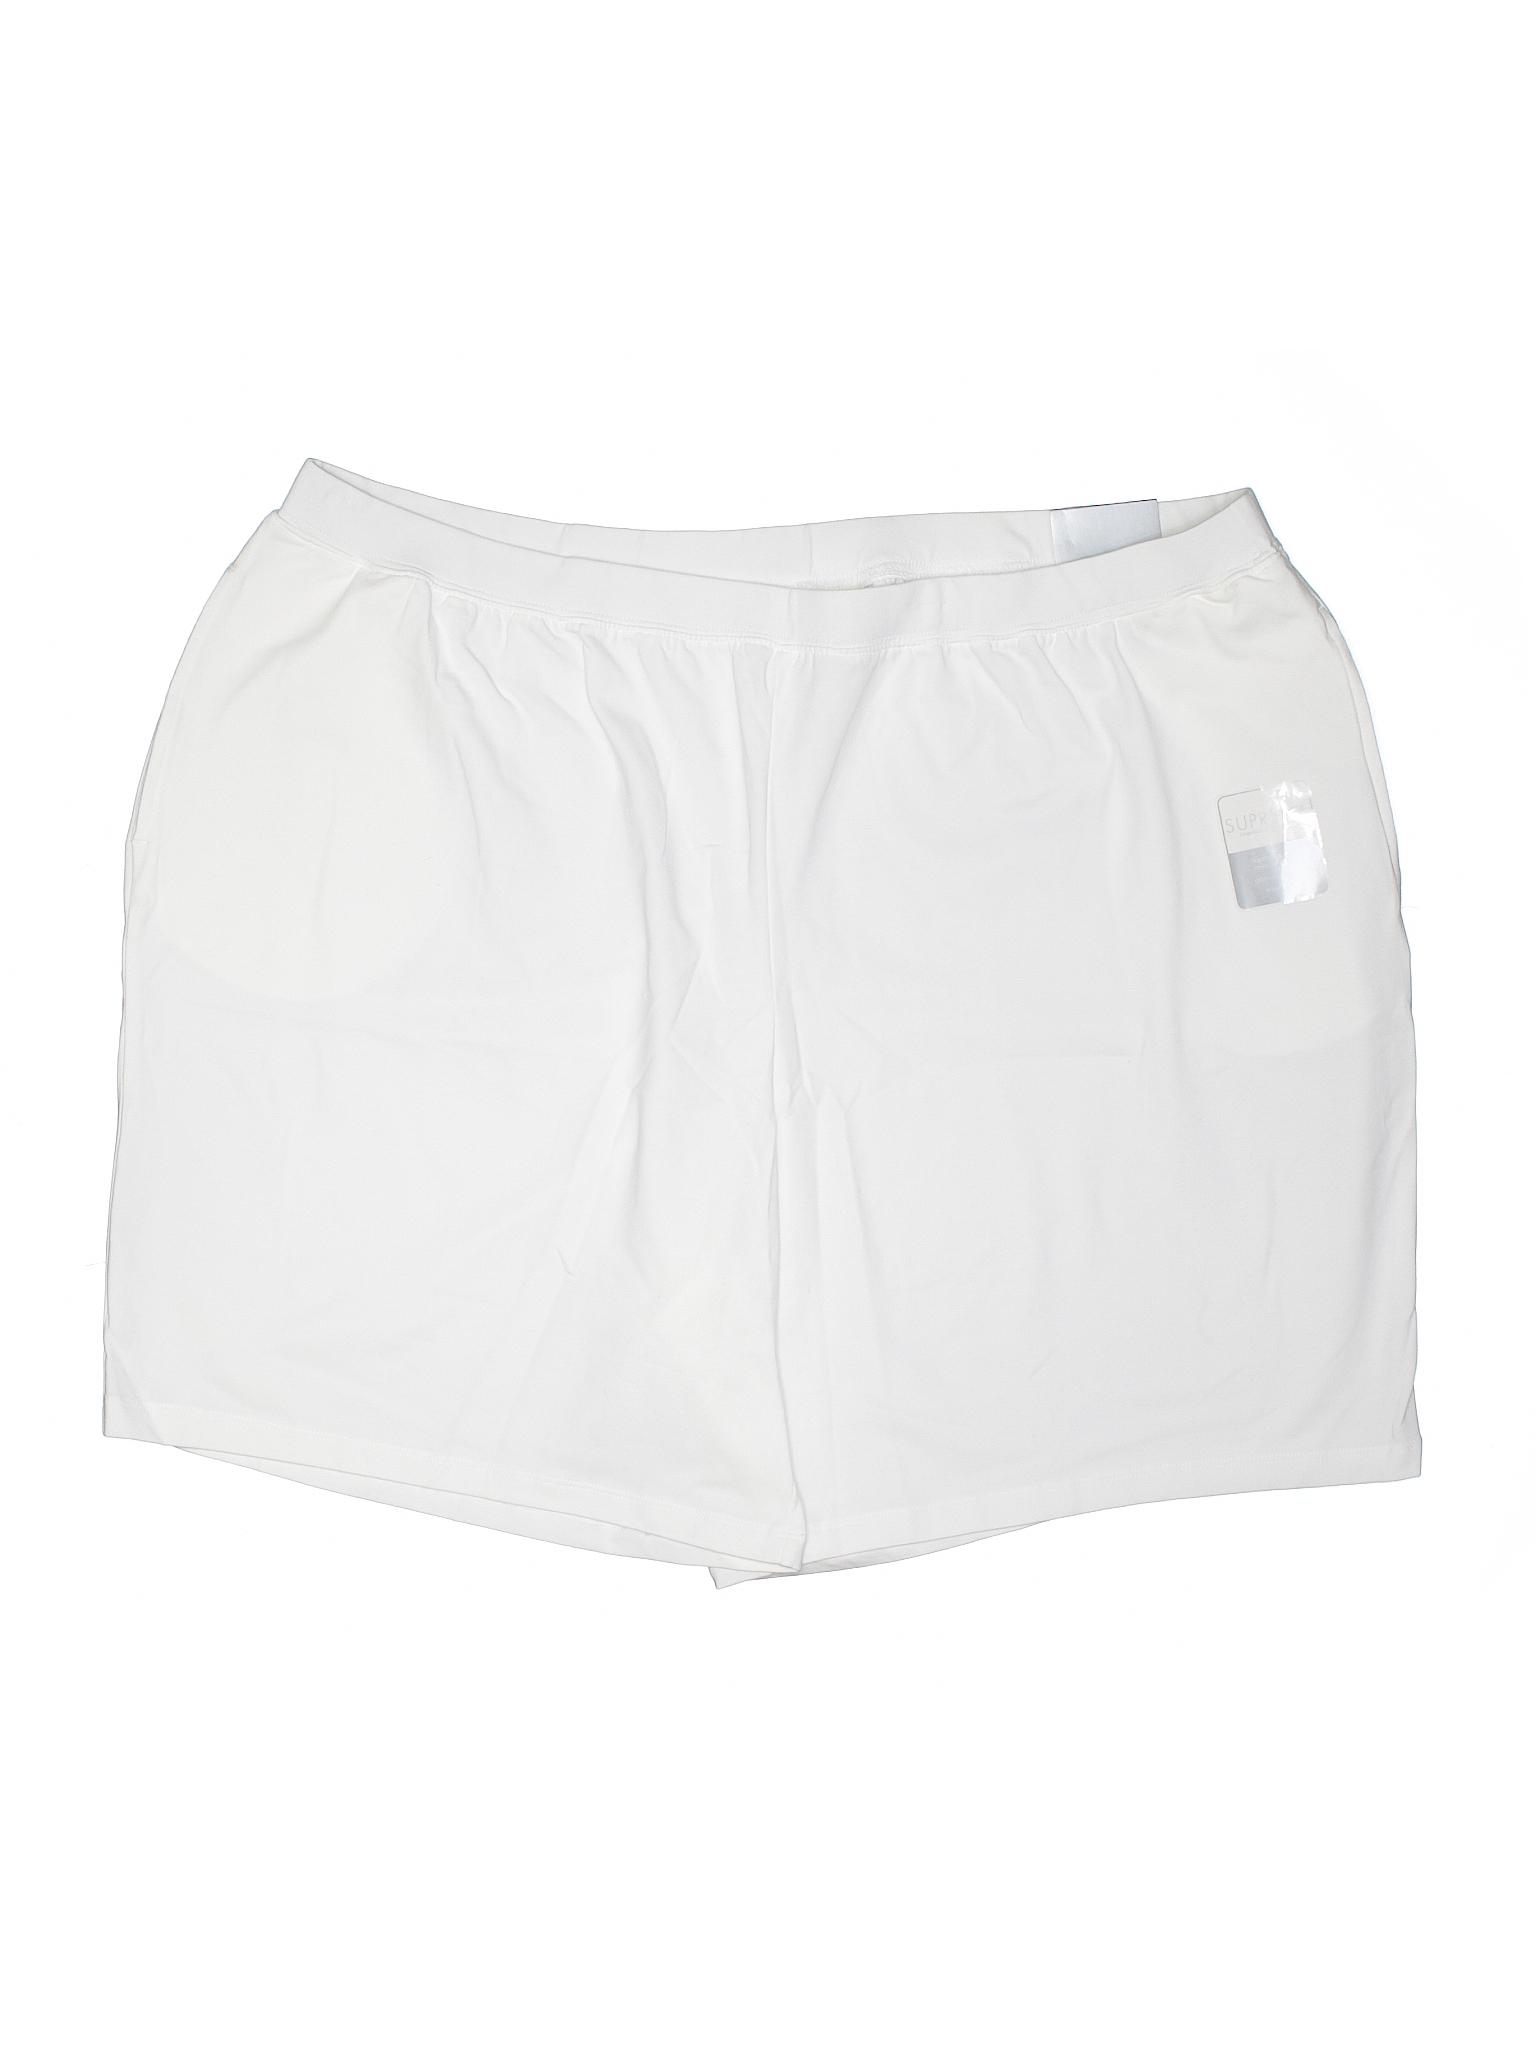 Shorts Catherines Catherines Catherines Boutique Boutique Boutique Shorts Boutique Shorts 6gwSfq